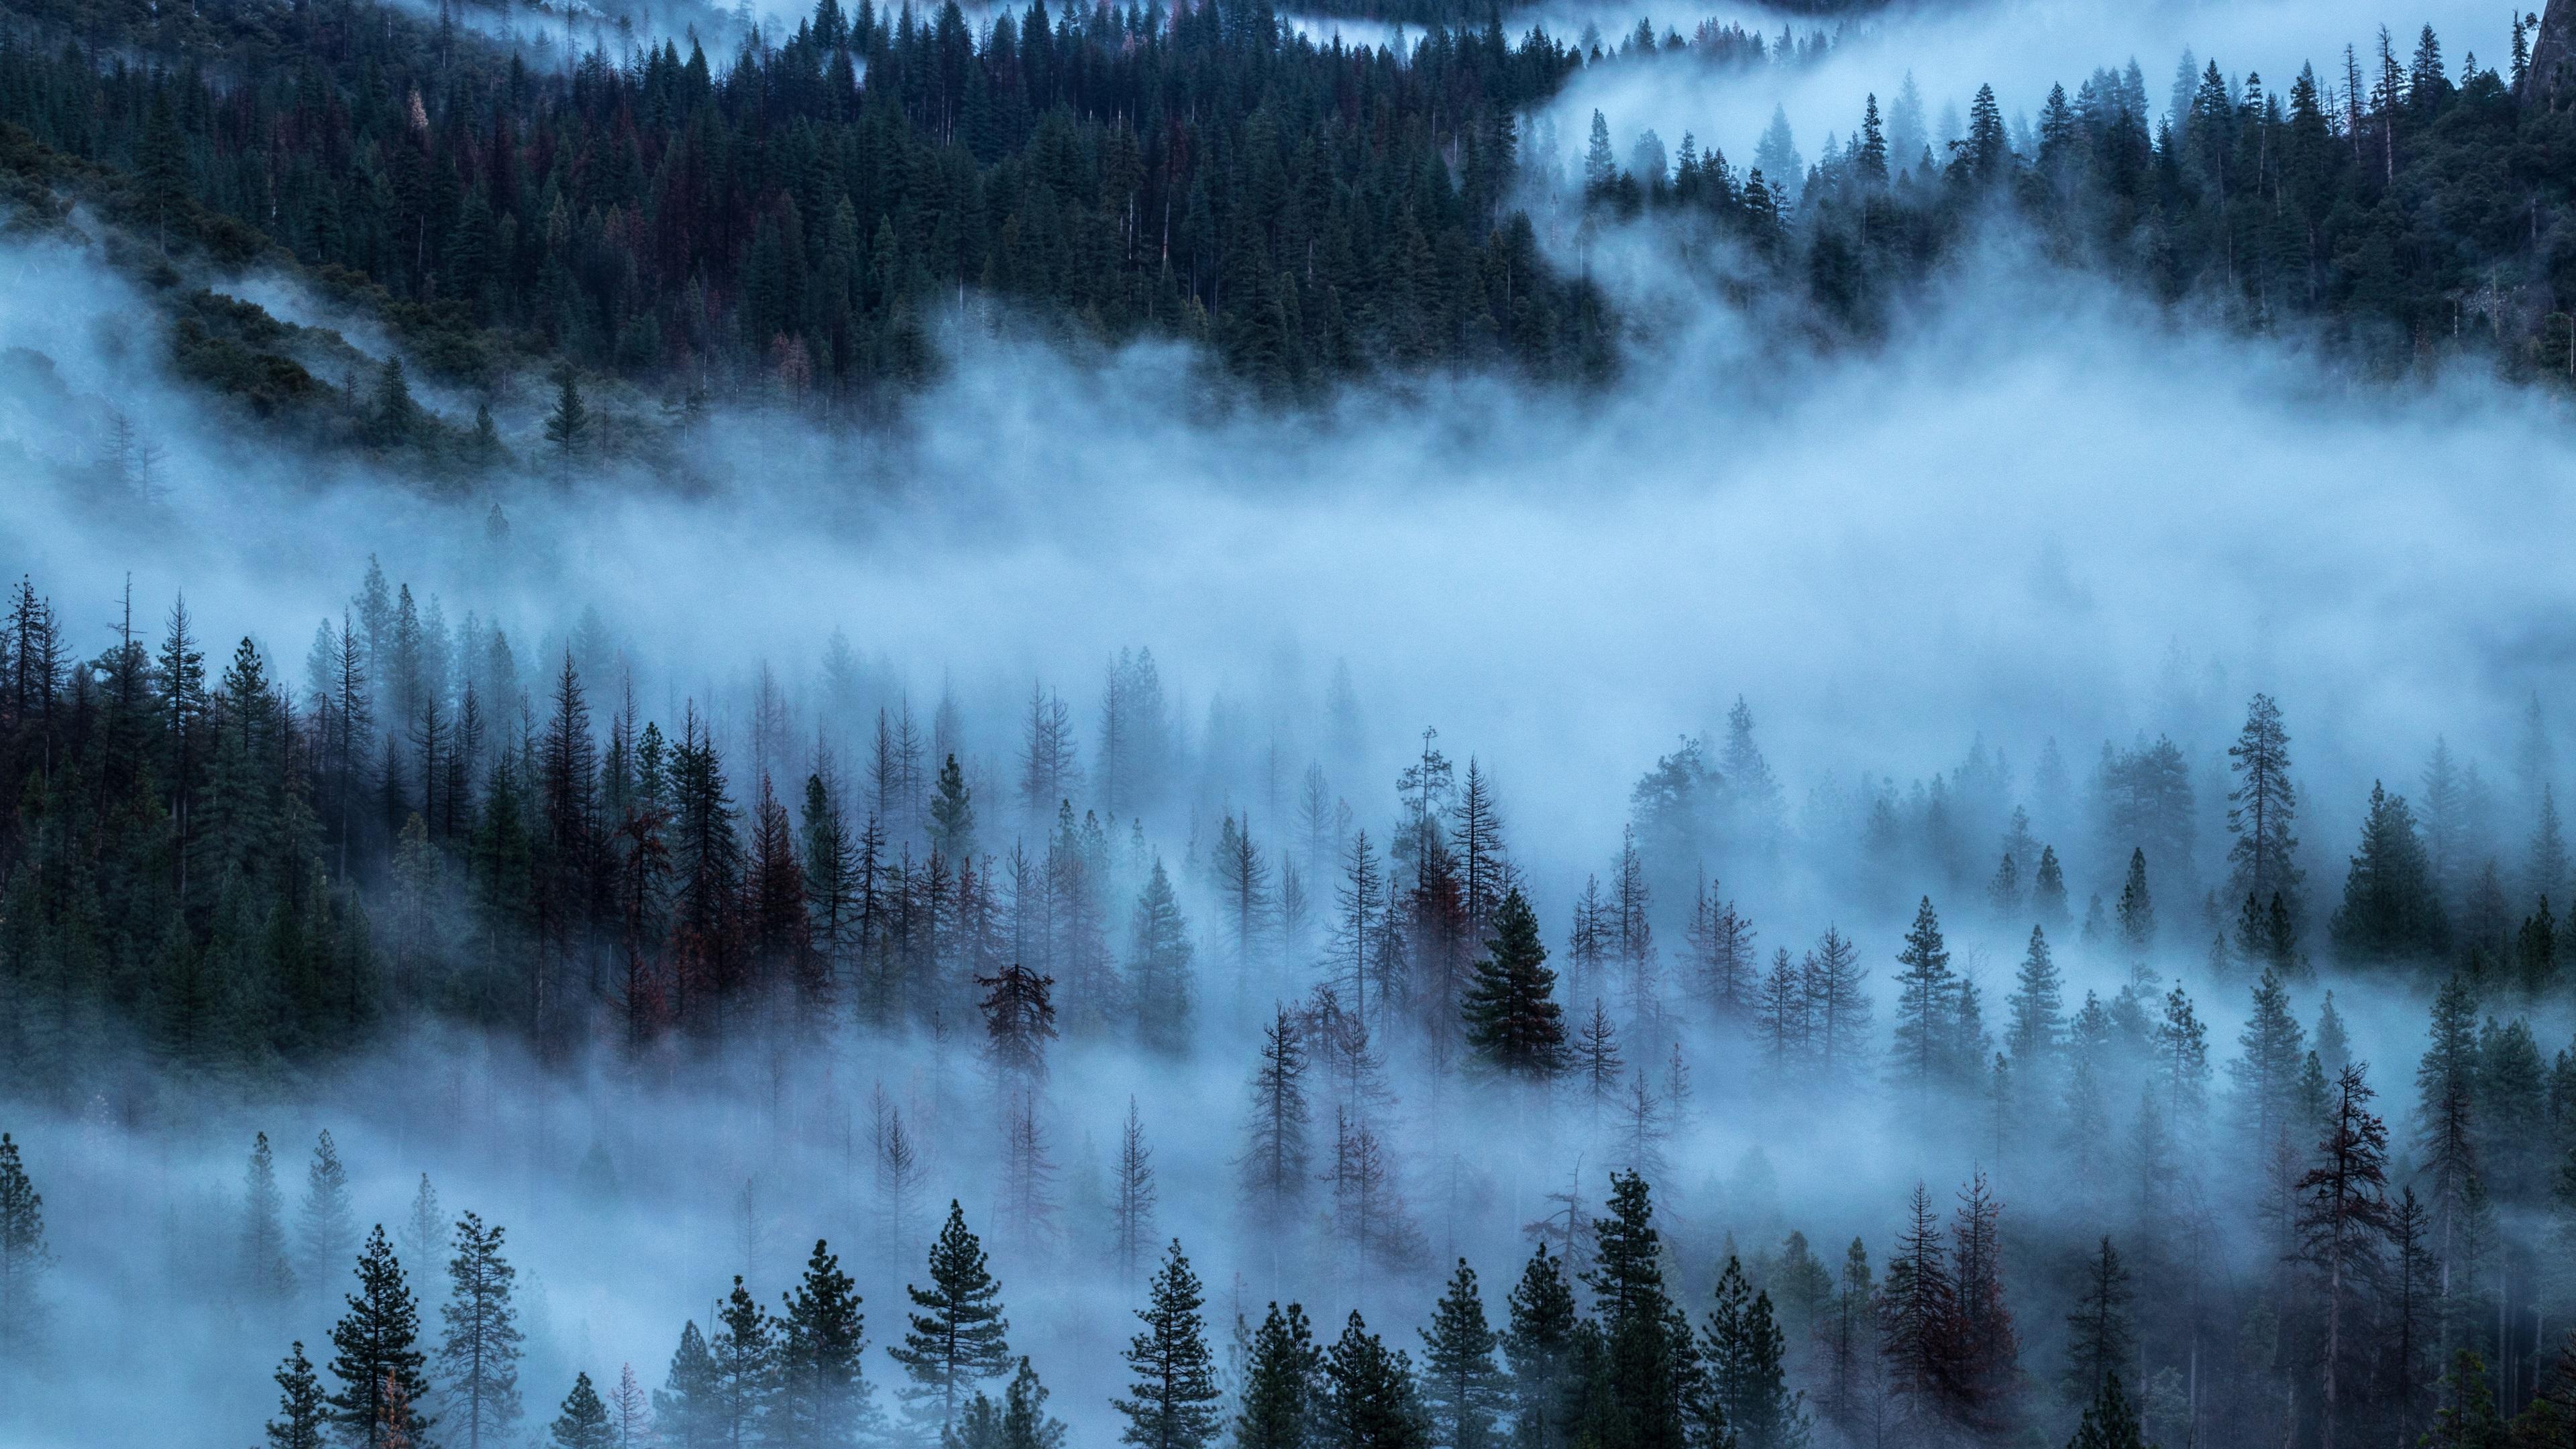 Download Wallpaper 3840x2160 Trees Forest Fog Uhd 4k